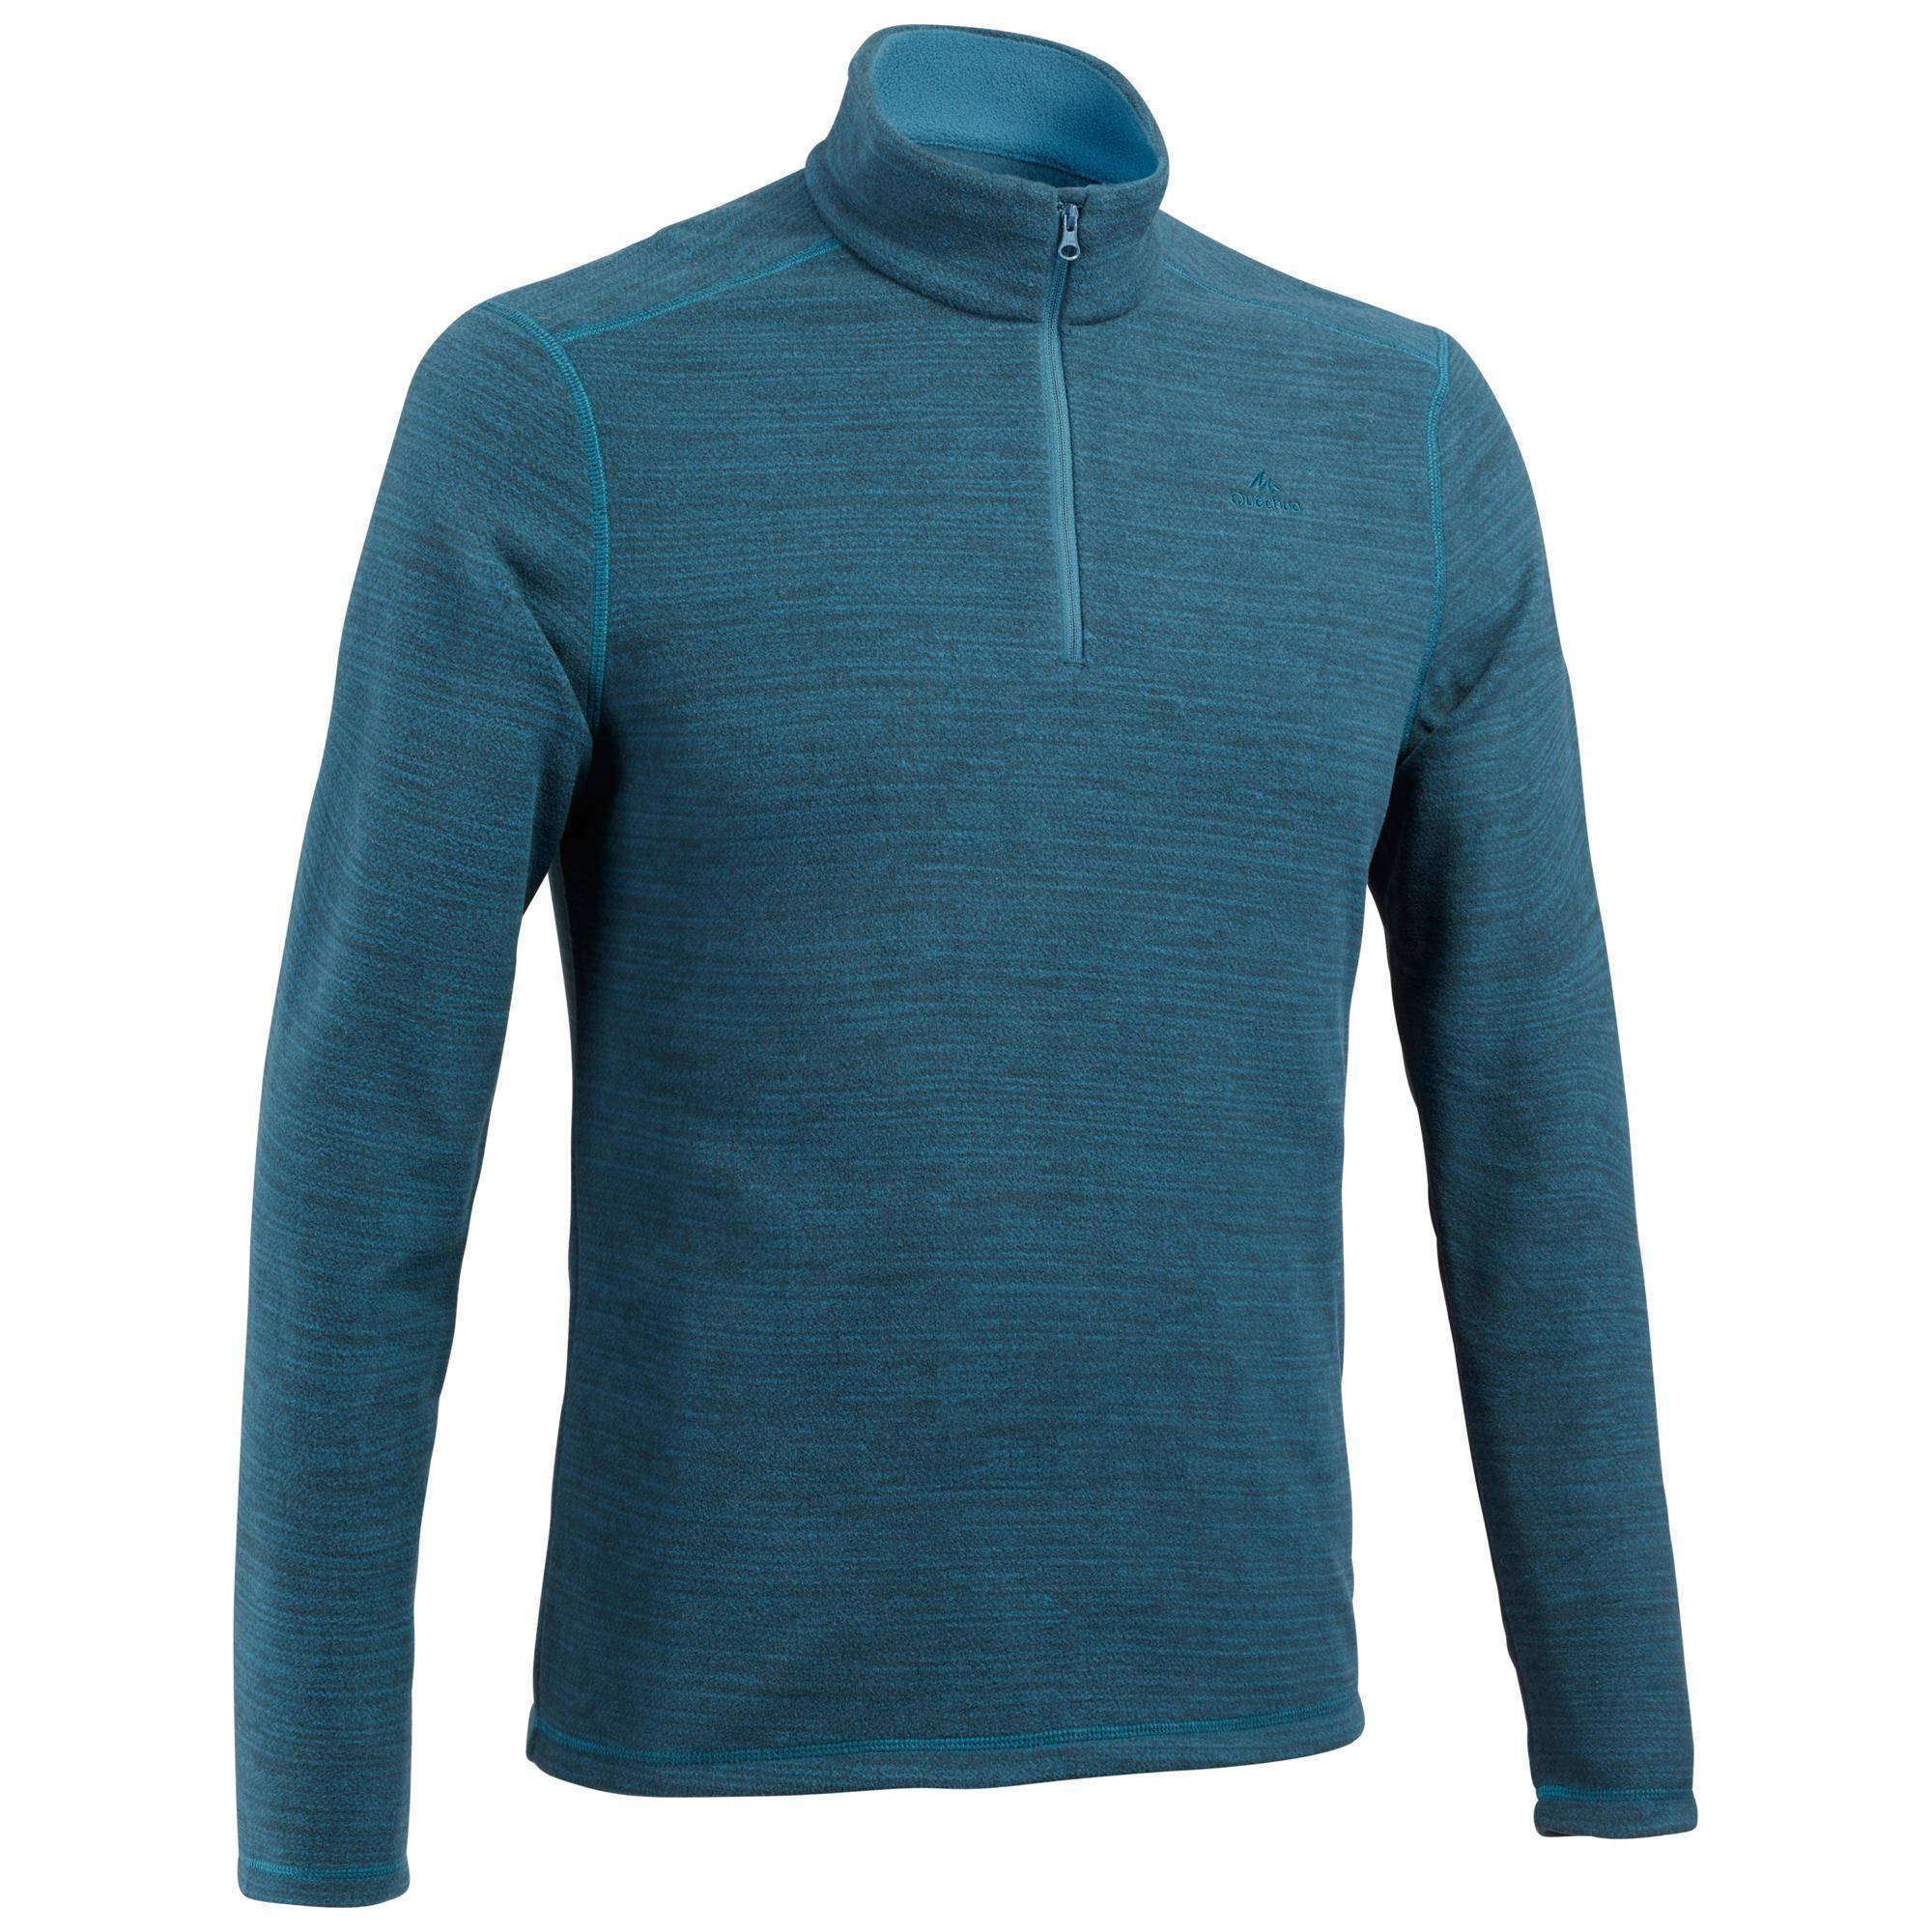 Fleecepullover Bergwandern MH100 Herren blau meliert | Sportbekleidung > Fleecepullover | Blau | Quechua